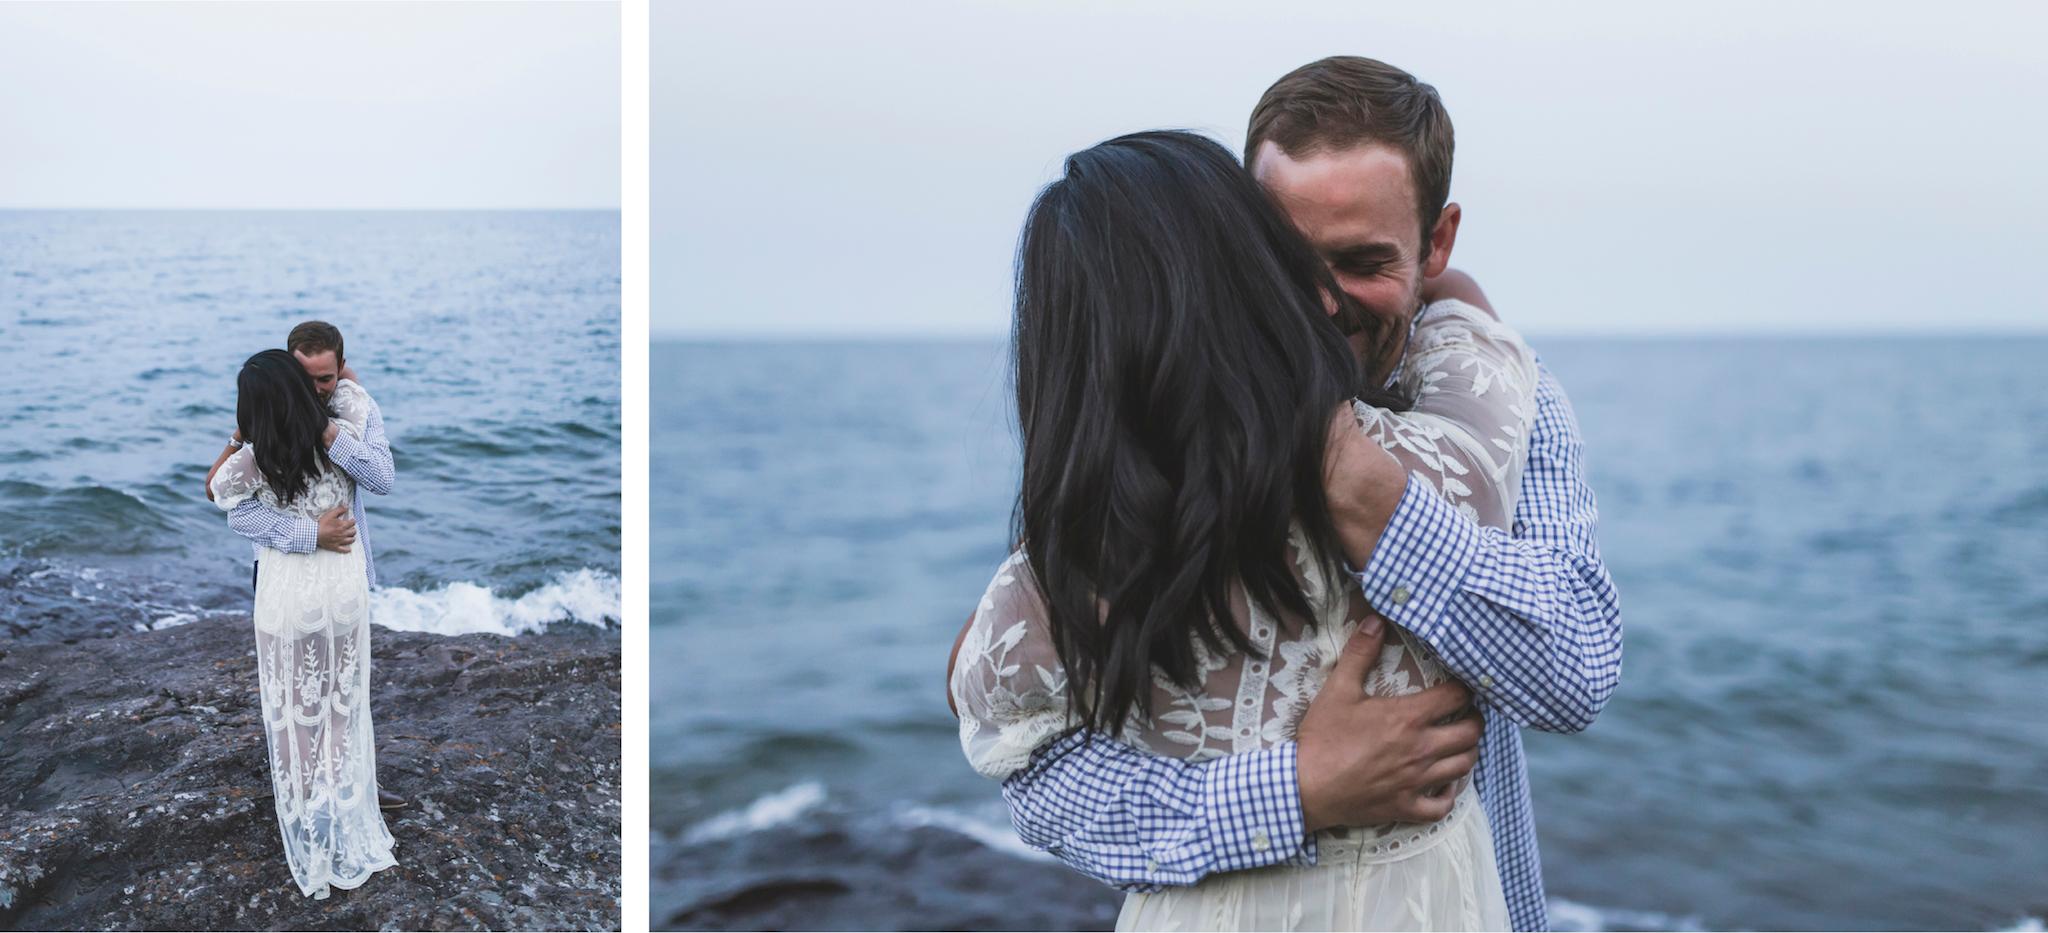 north shore minnesota engagement wedding photographer-79.jpg